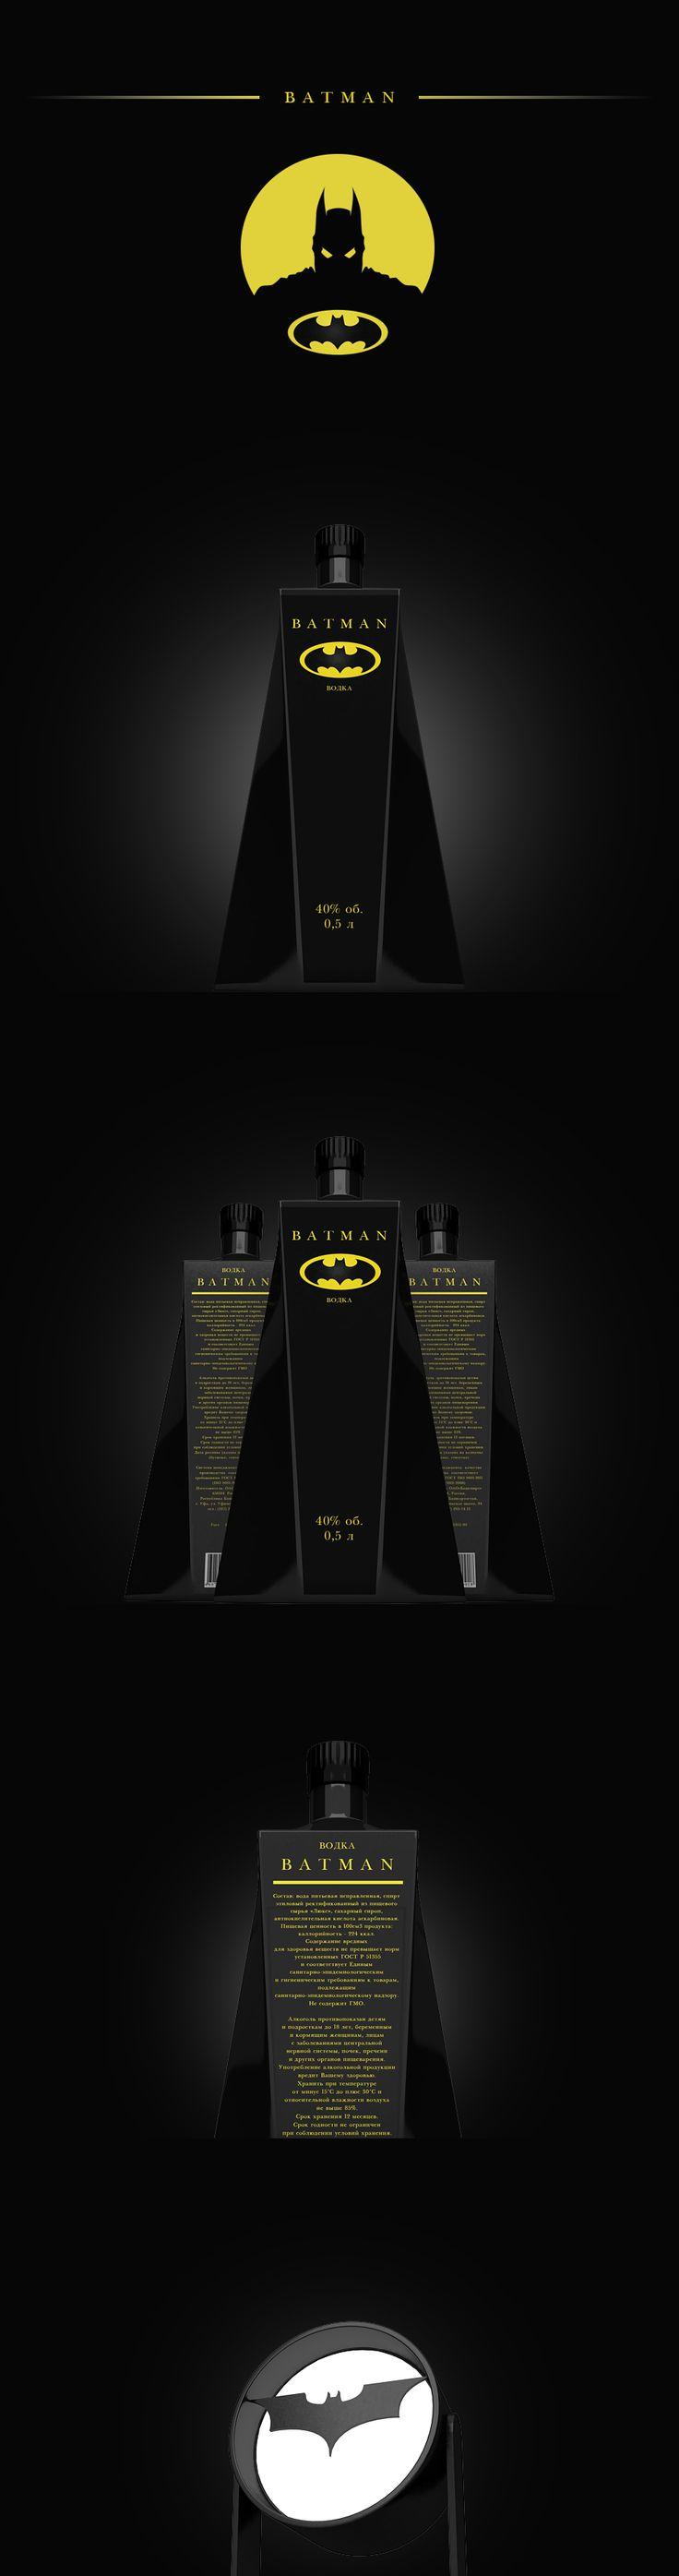 Vodka Batman — Packaging